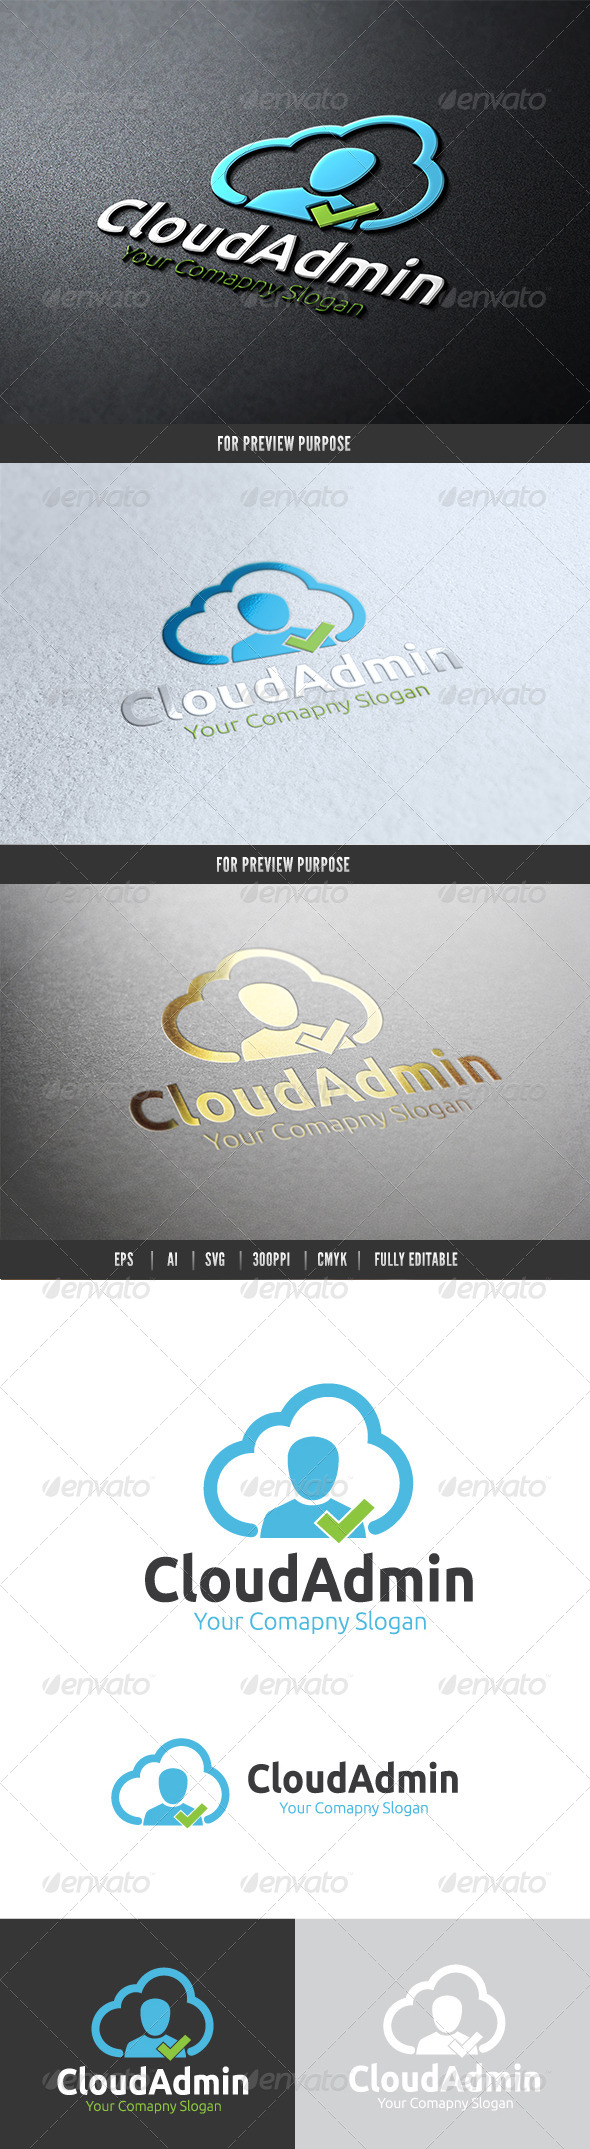 Cloud Admin